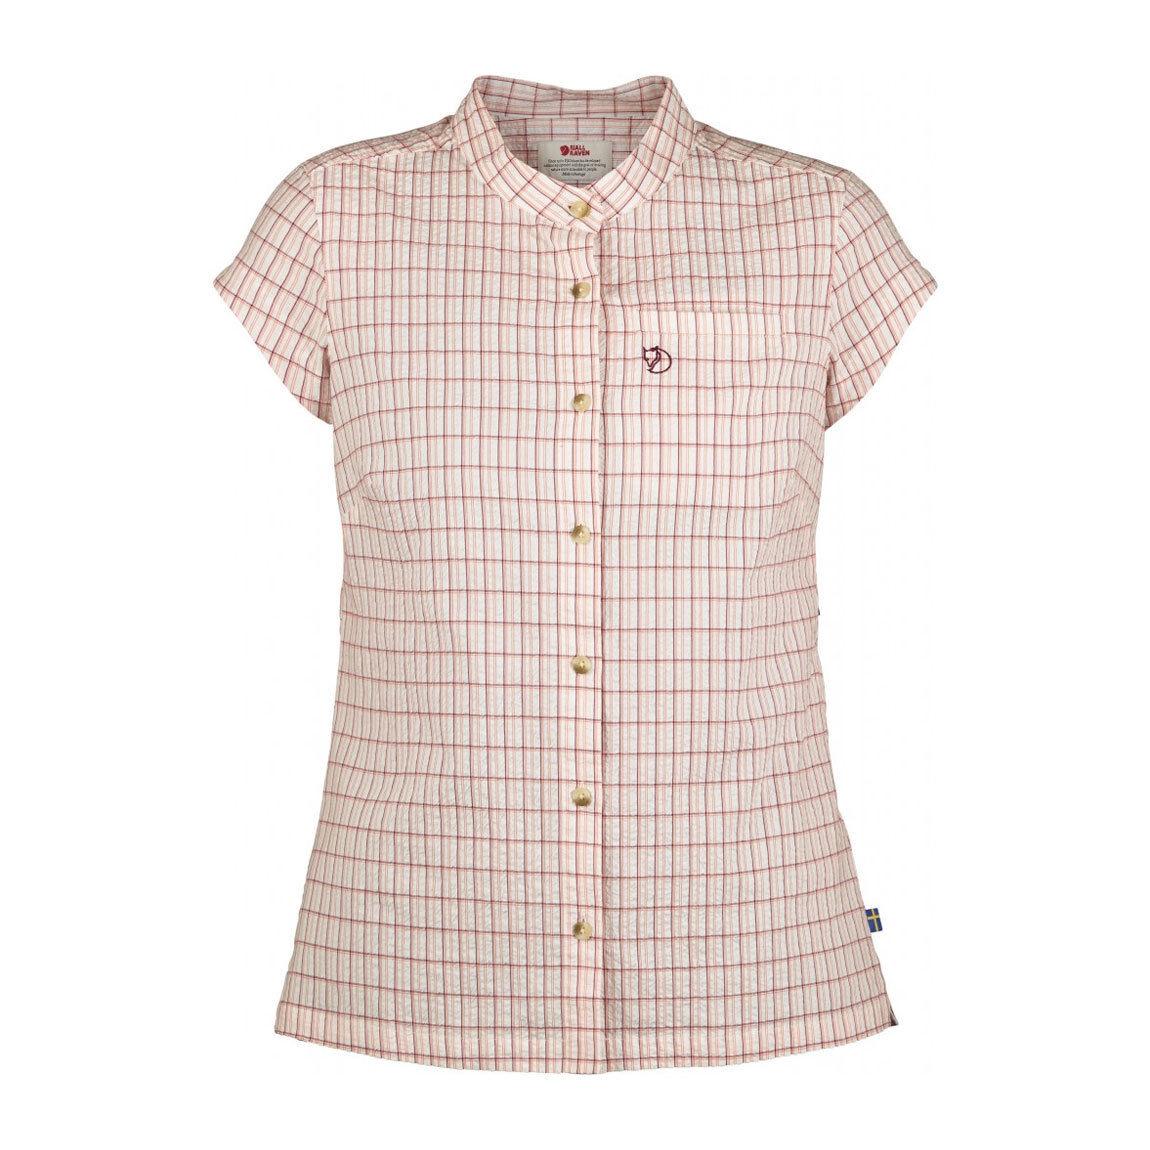 Fjallraven Ovik Seersucker Camisa para mujer-sin Uso vendedor de muestra